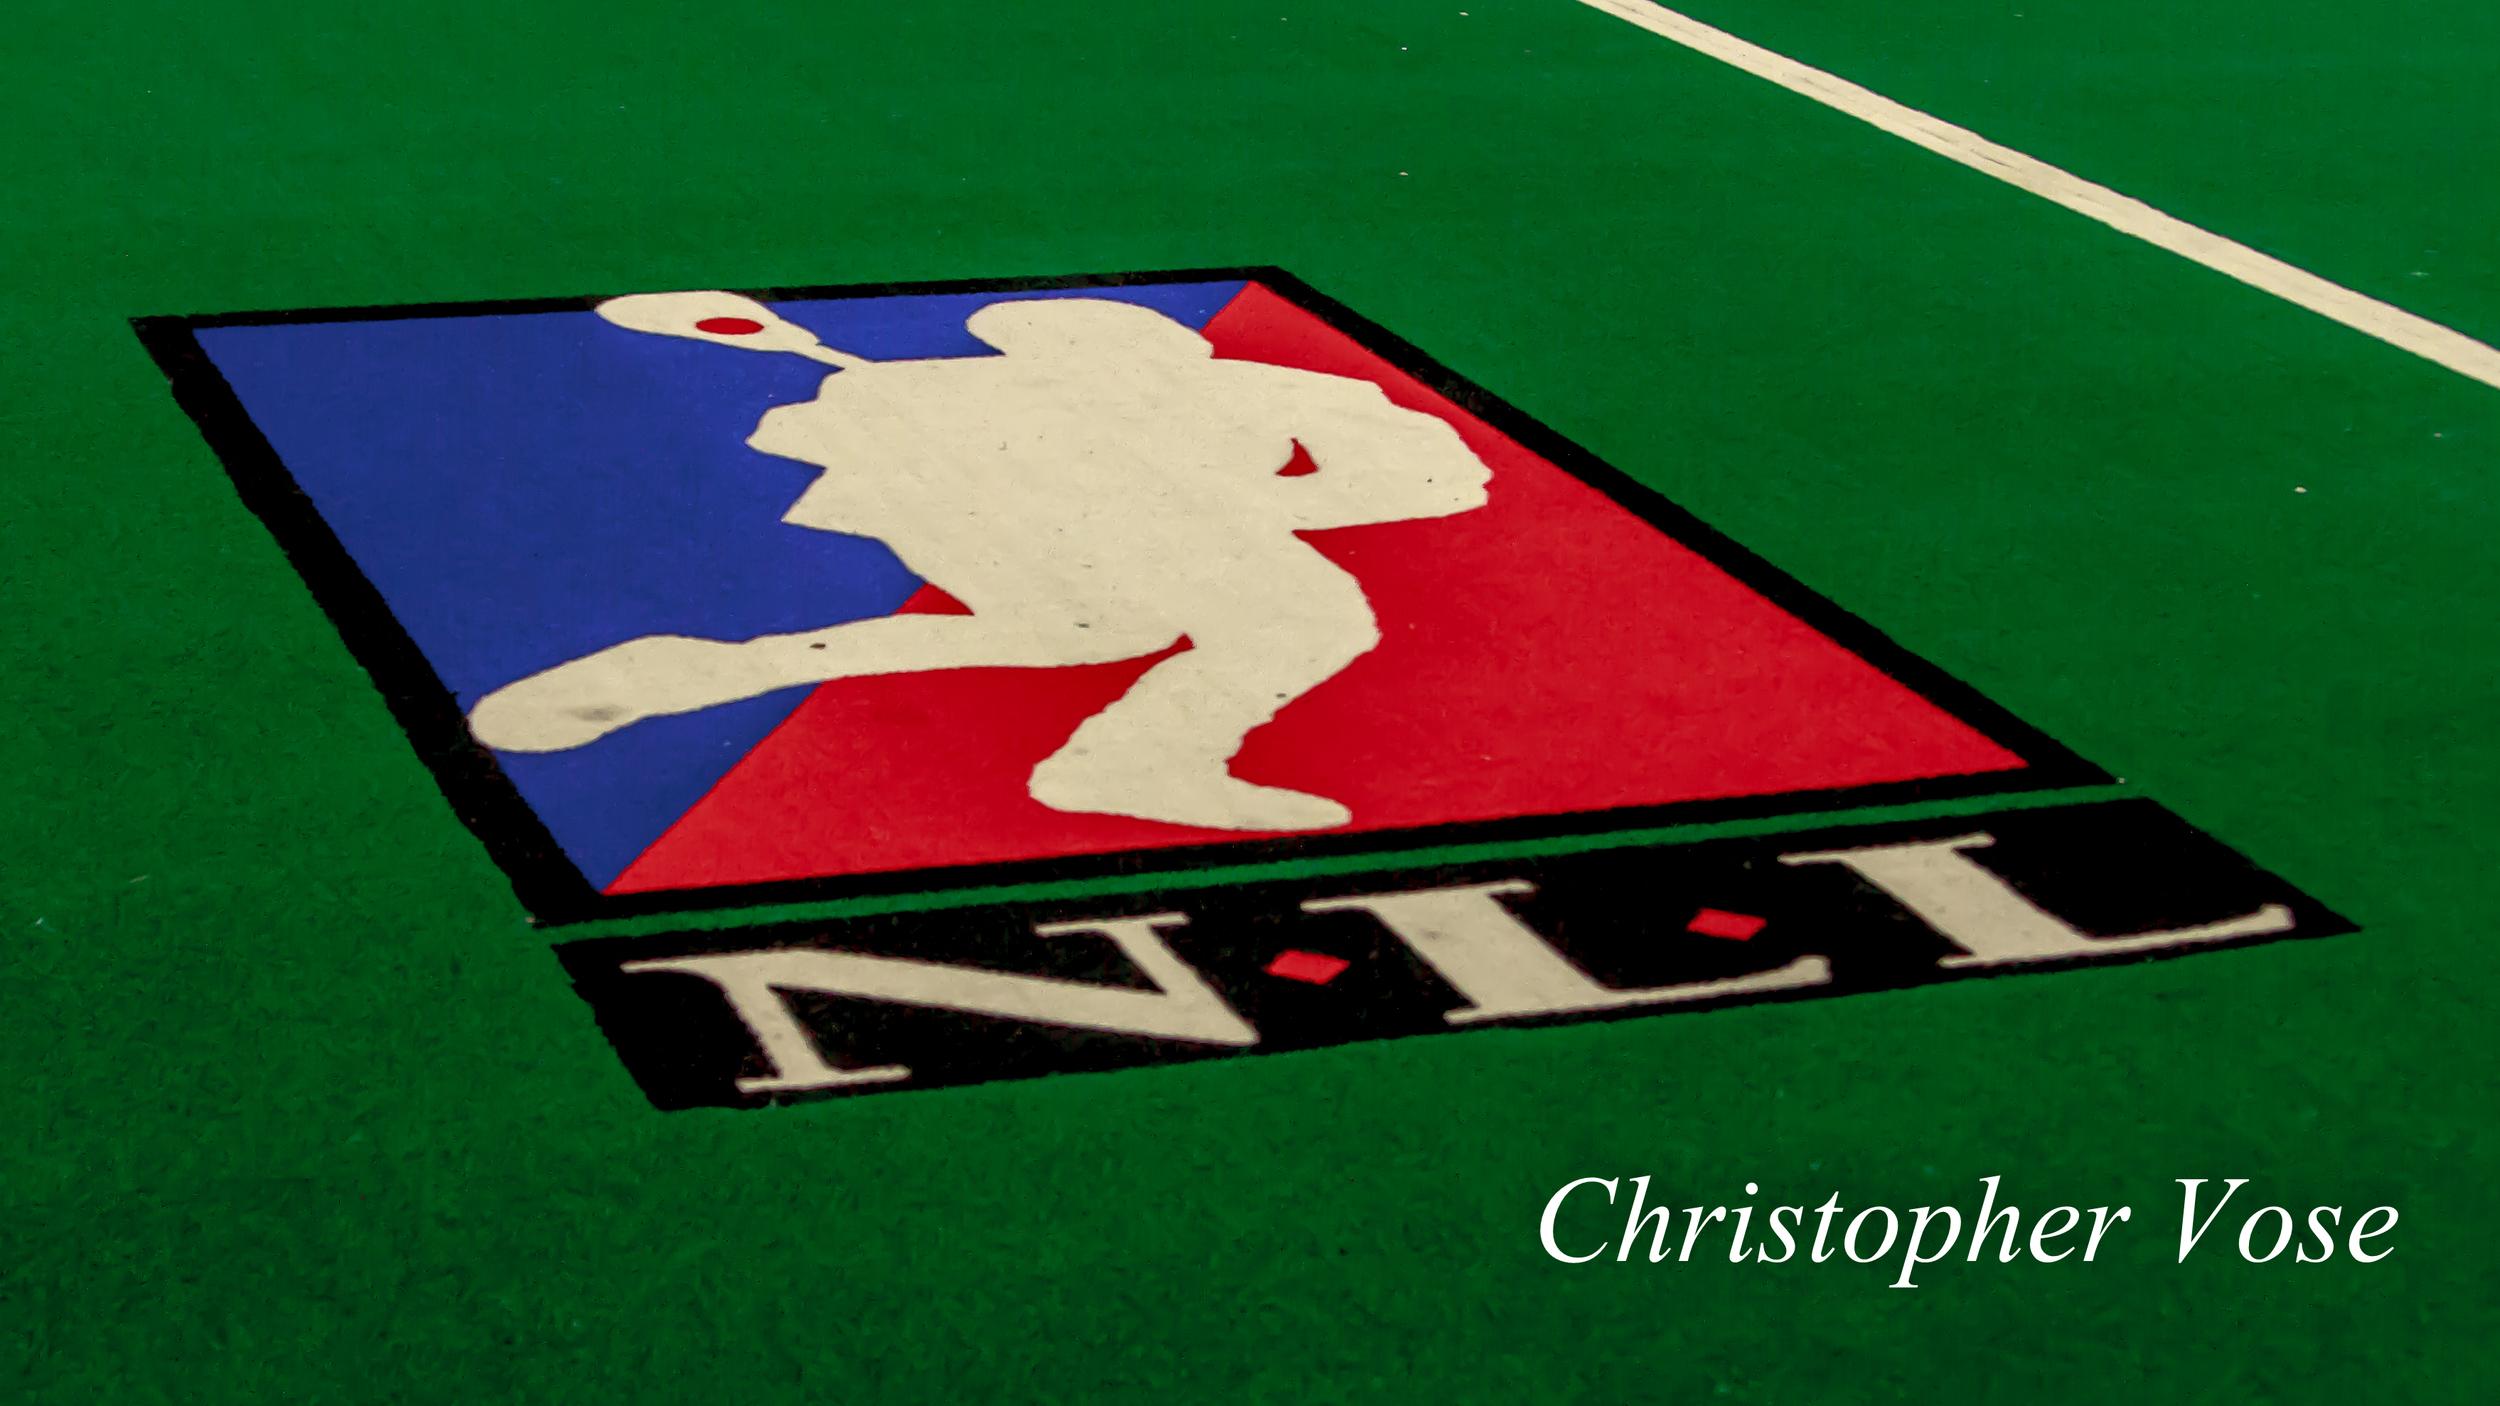 2013-12-21 National Lacrosse League.jpg